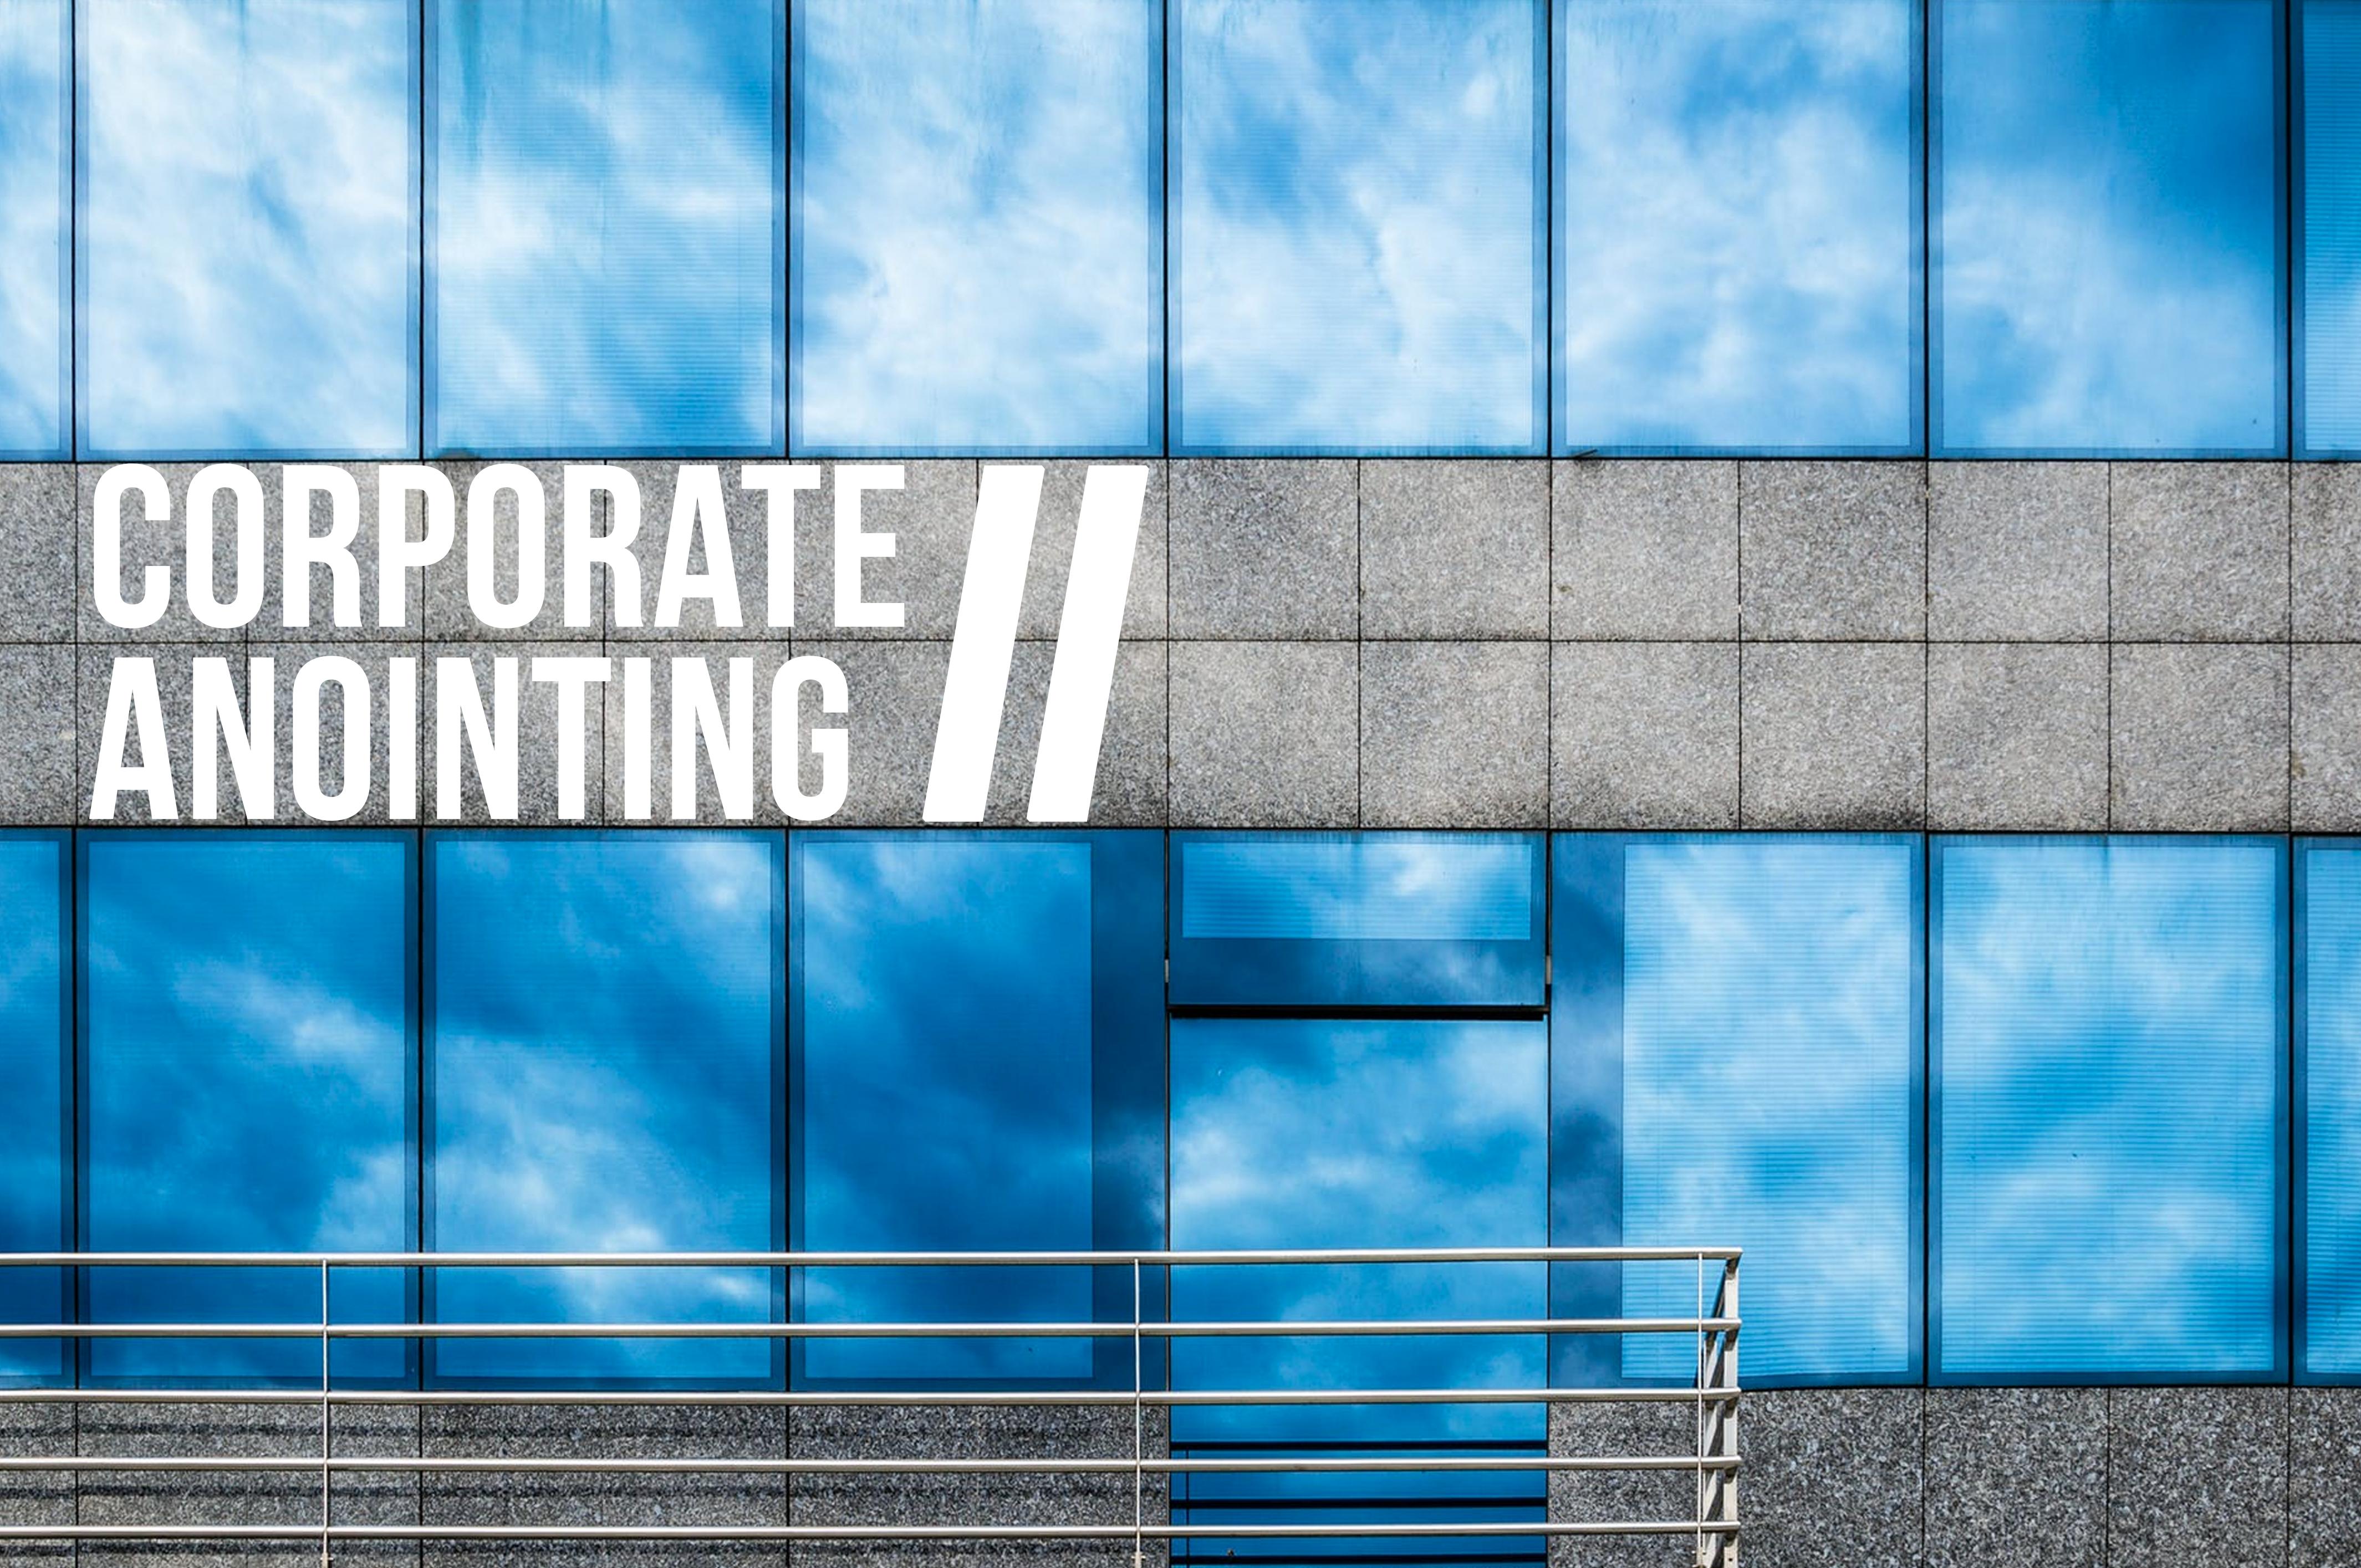 Corporate Anointing II